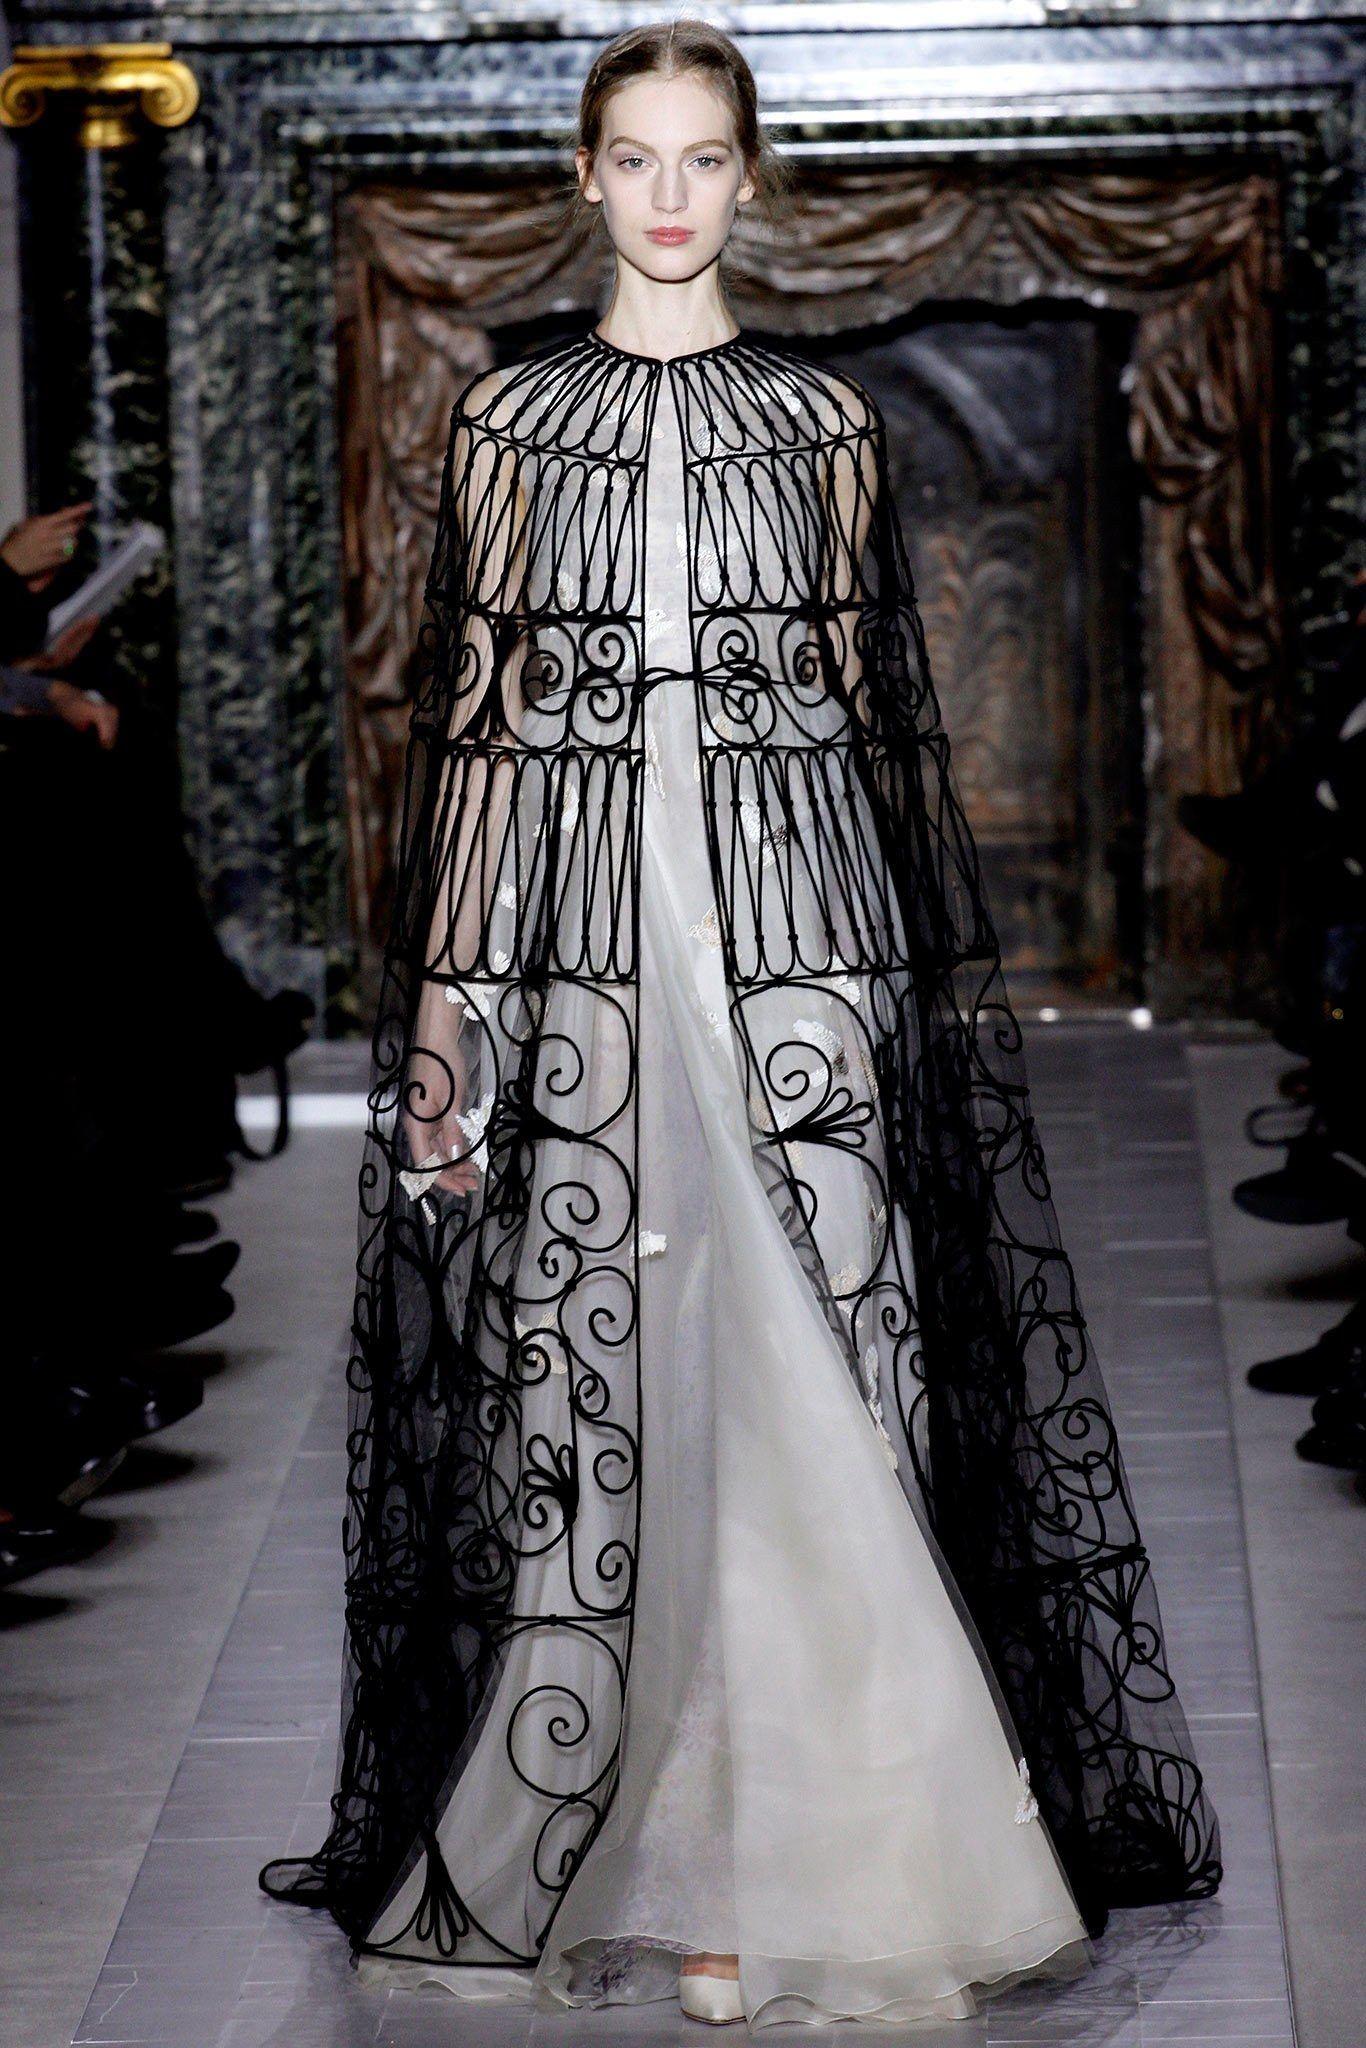 Valentino Spring 2013 Couture Fashion Show - Vanessa Axente (Viva)